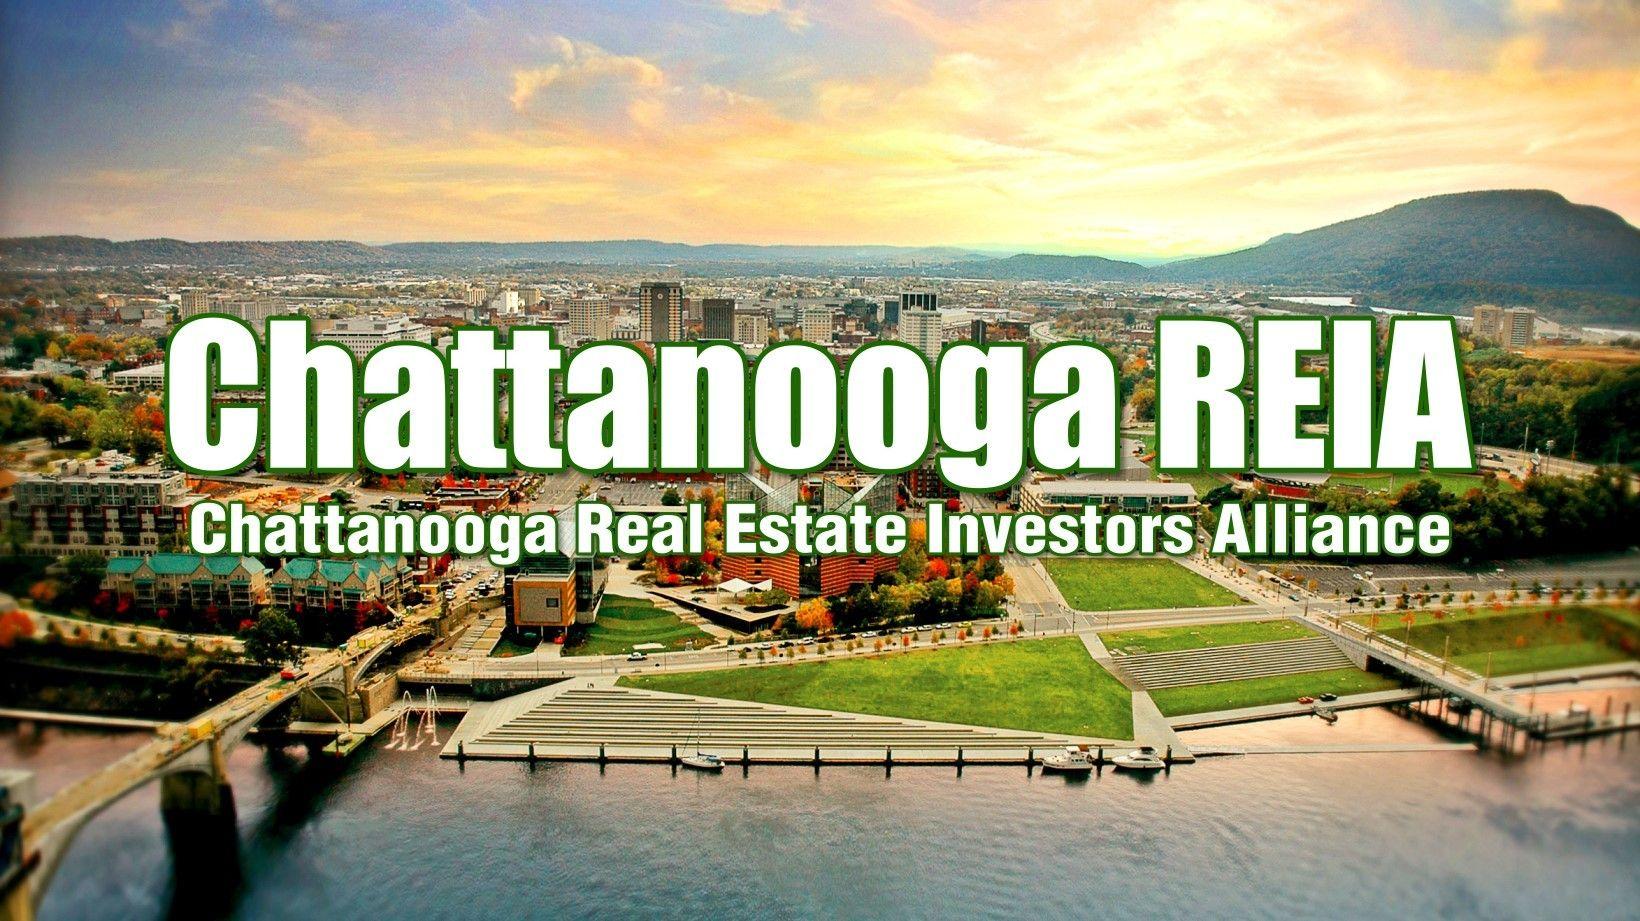 Chattanooga Real Estate Investors Alliance: Chattanooga REIA